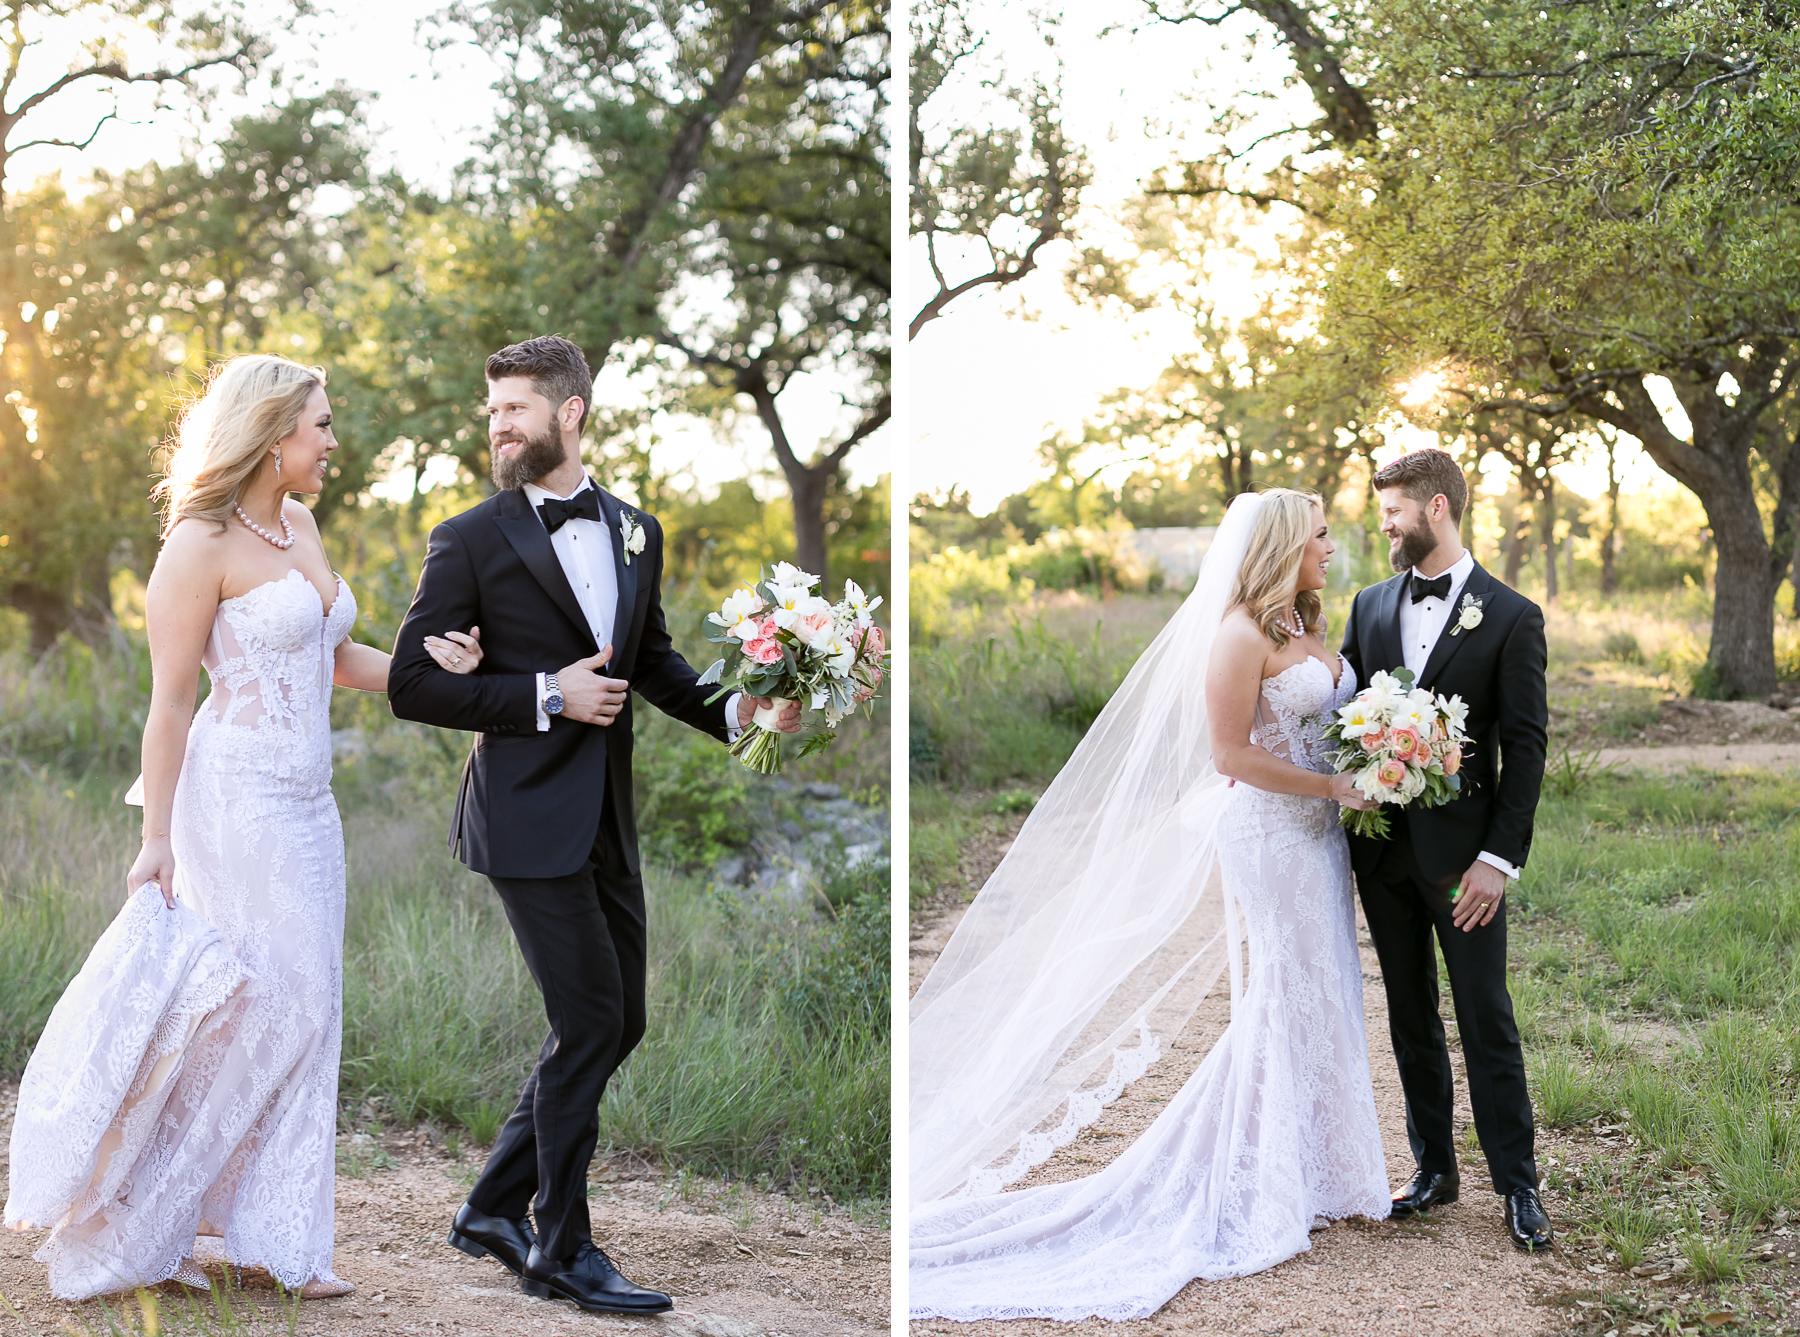 wedding-photo-and-video-austin.jpg